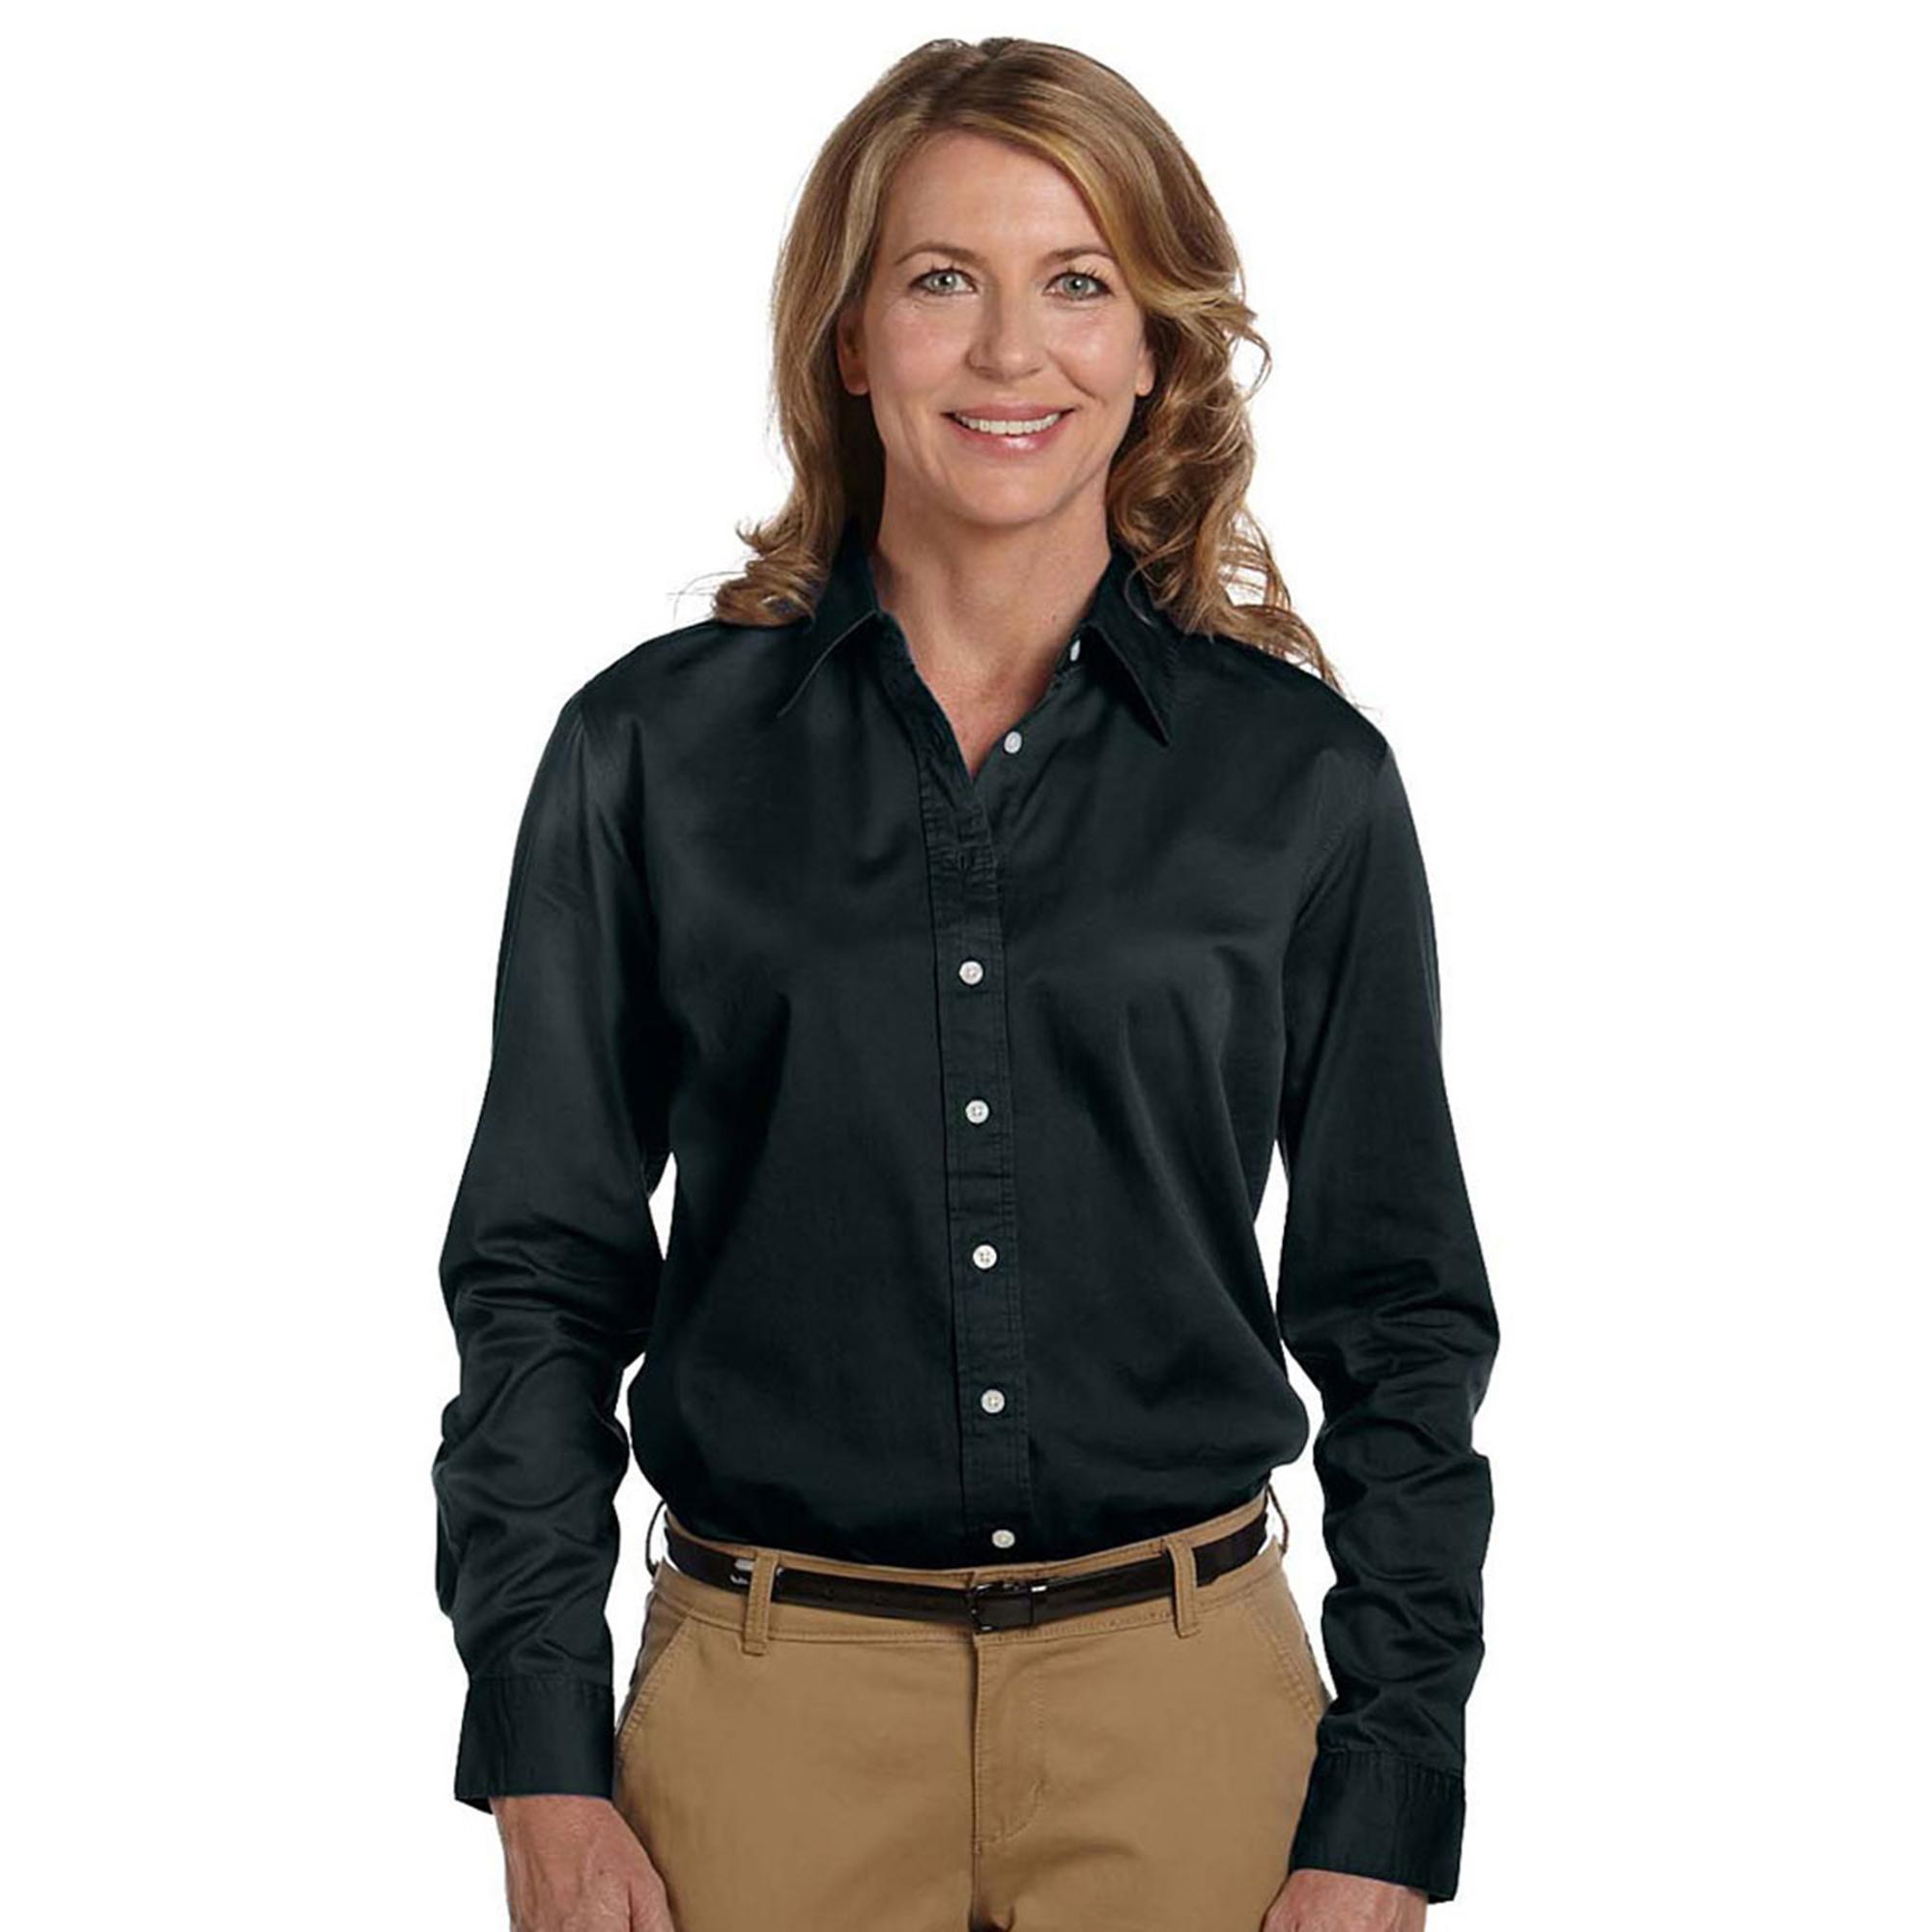 Chestnut Hill CH500W Women's Soft Spread Collar Twill Shirt at Sears.com